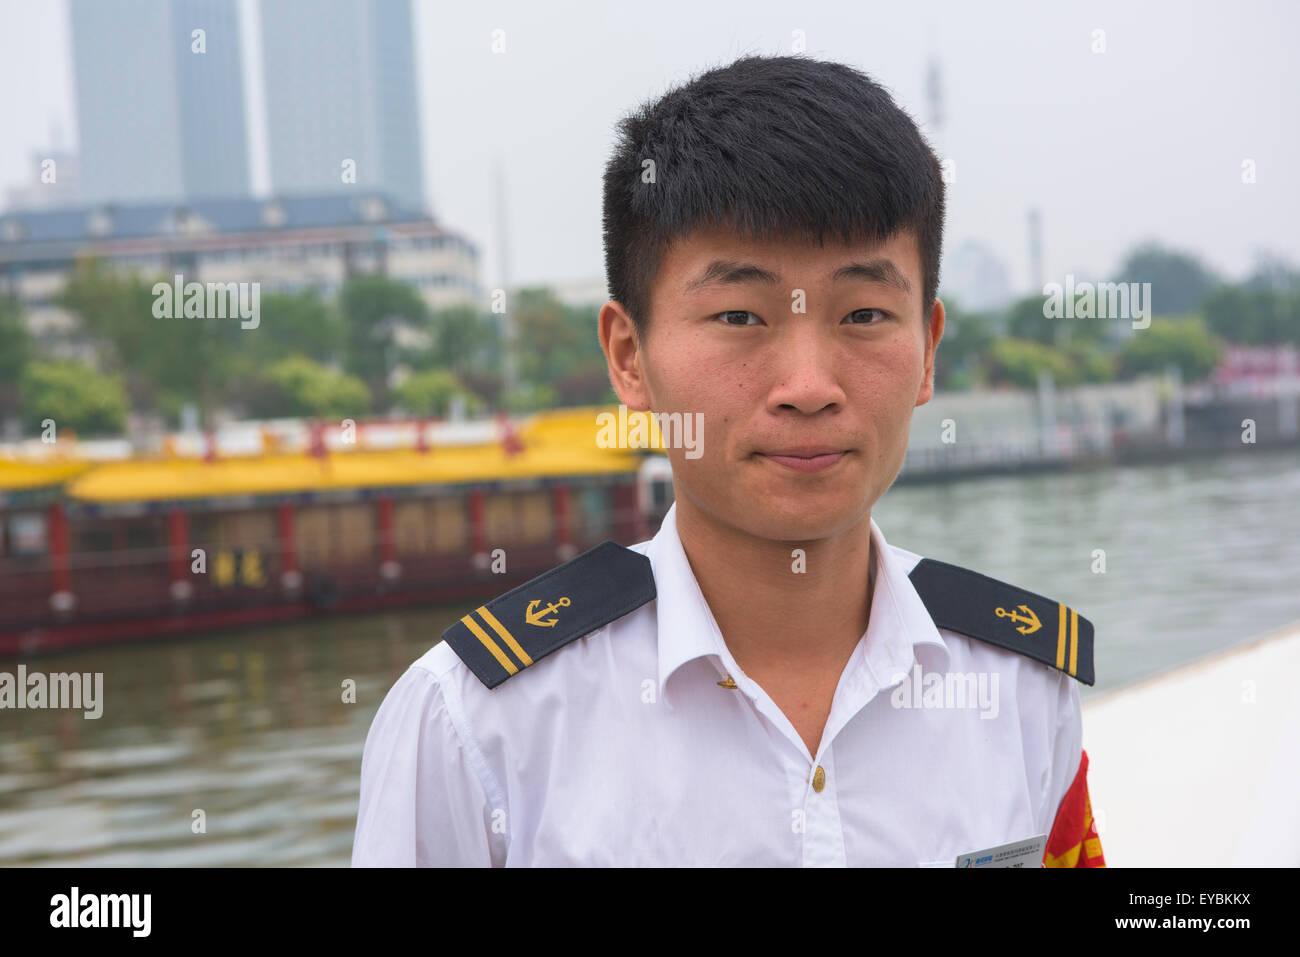 Officer Sailor Stock Photos & Officer Sailor Stock Images